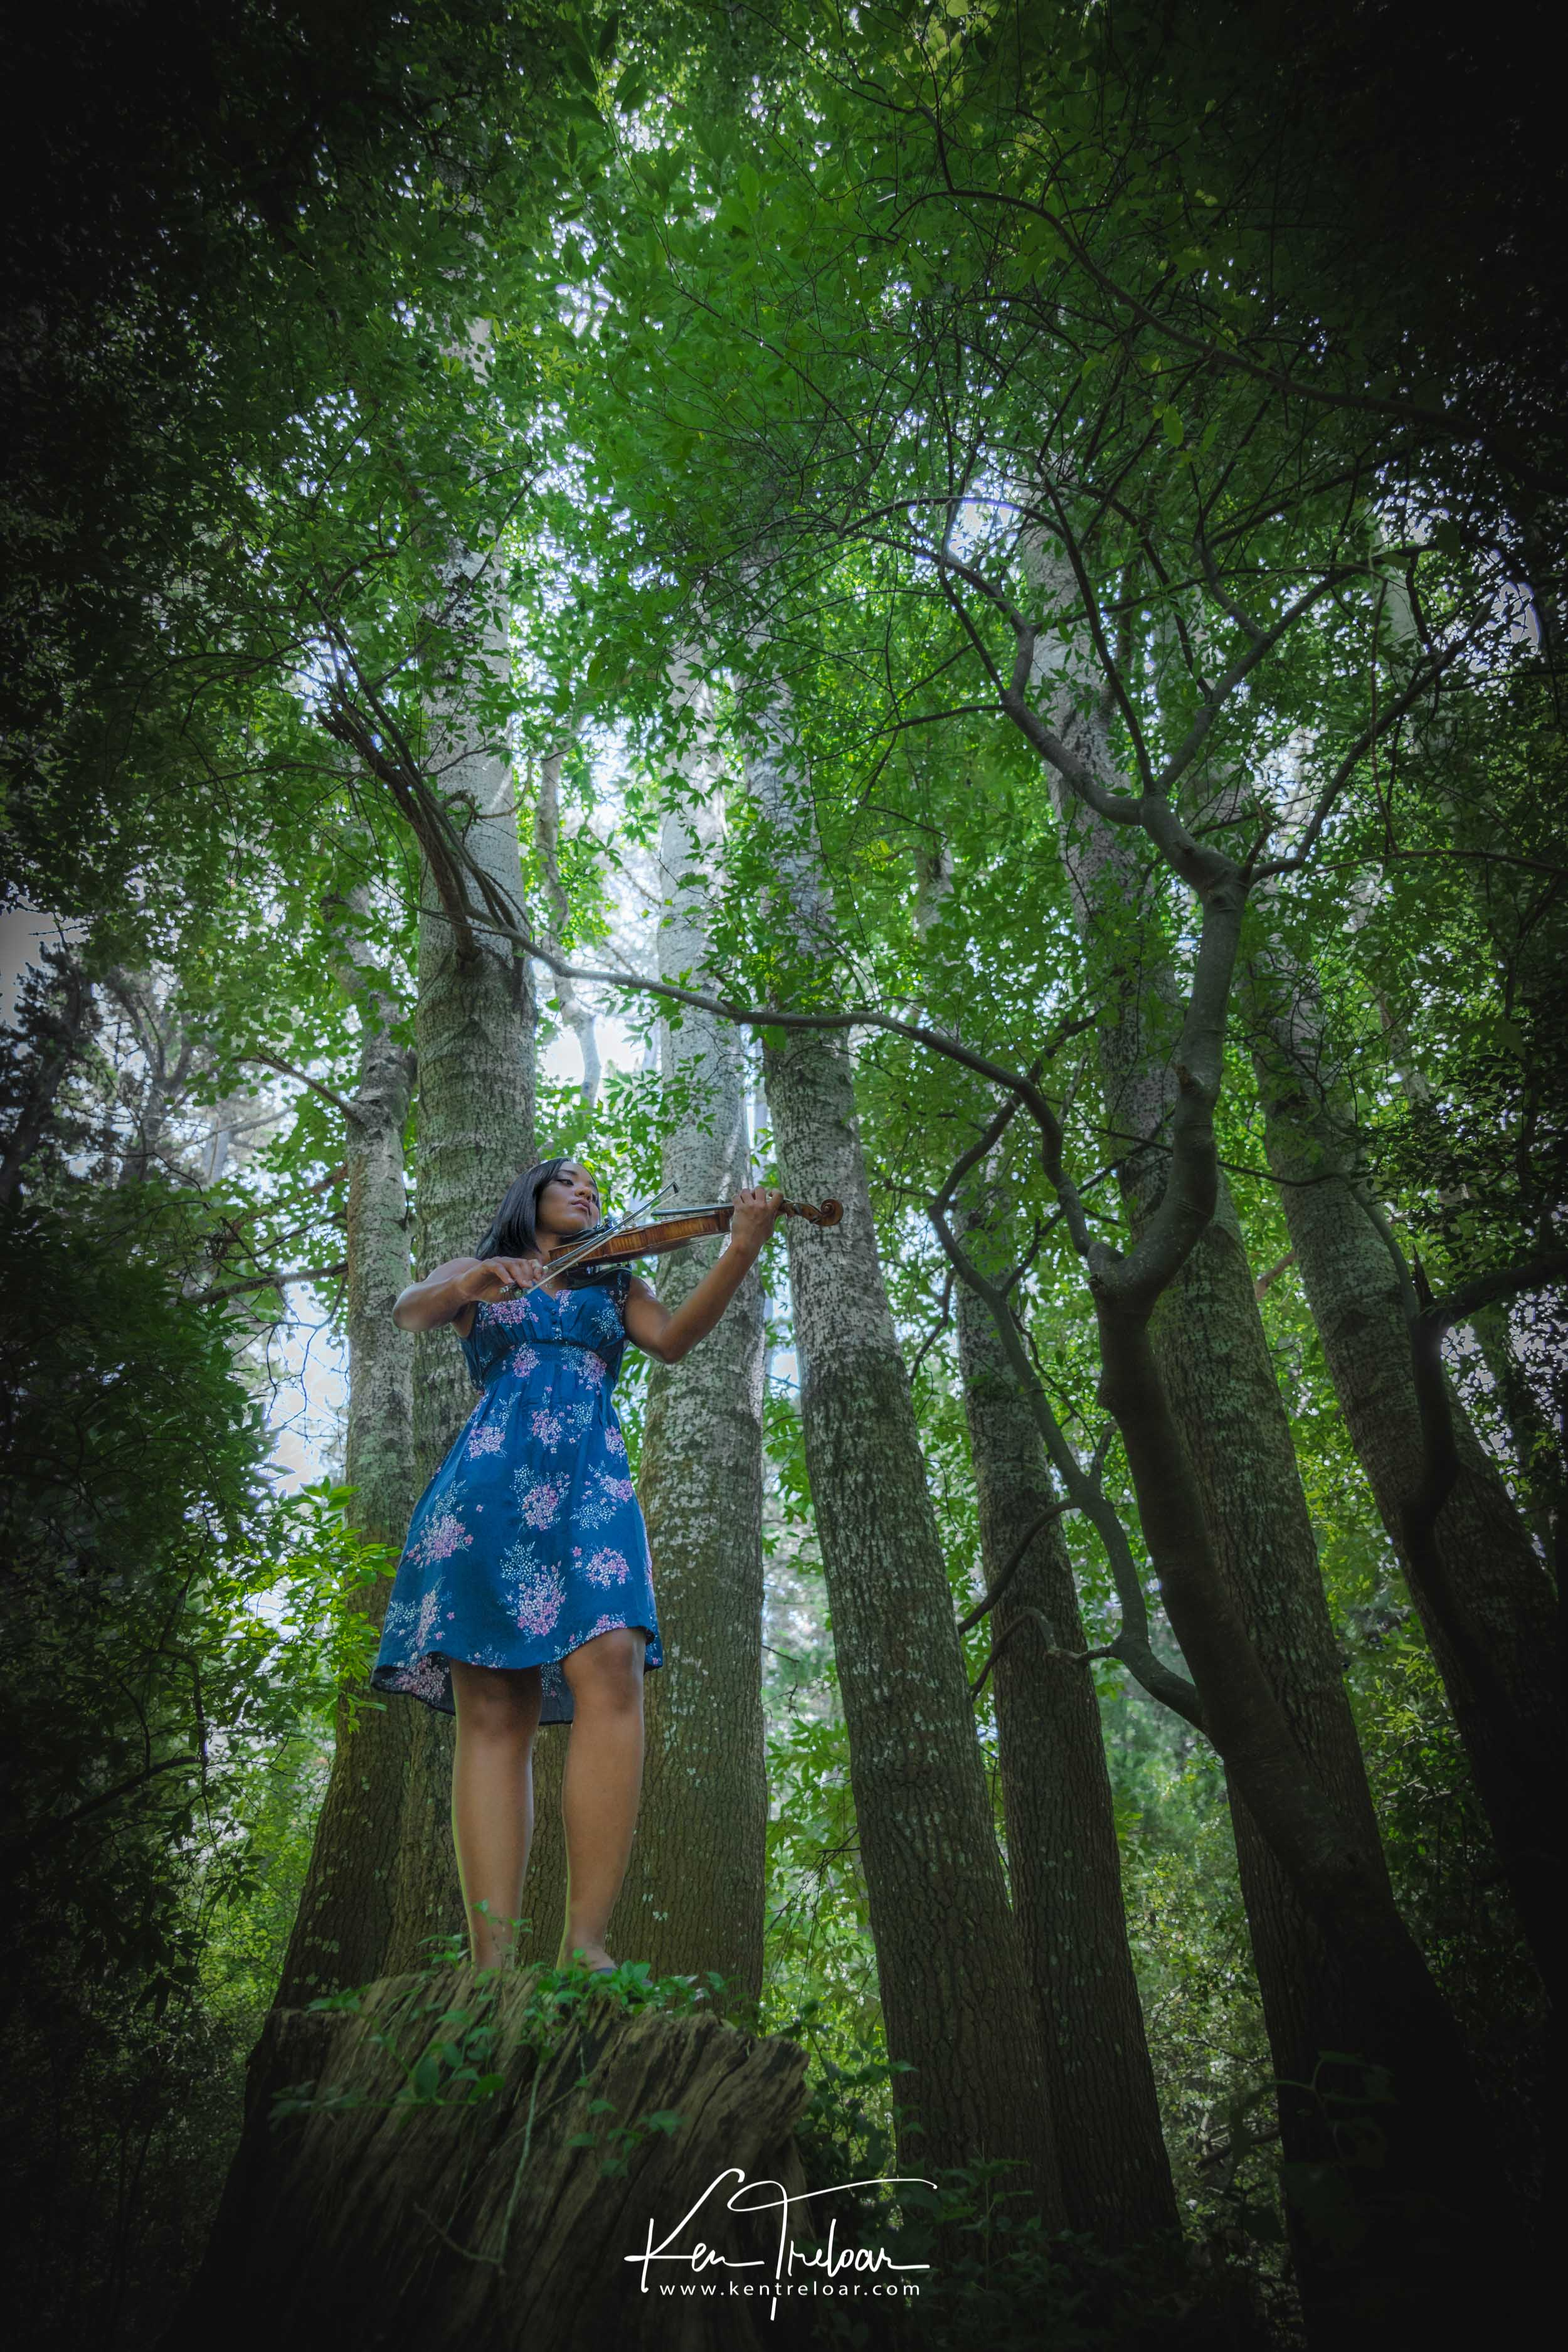 Ken Treloar Photography - Dec 2018 - Violin Woodland Forest Natural Light Portrait Photography - Cape Town-3.jpg